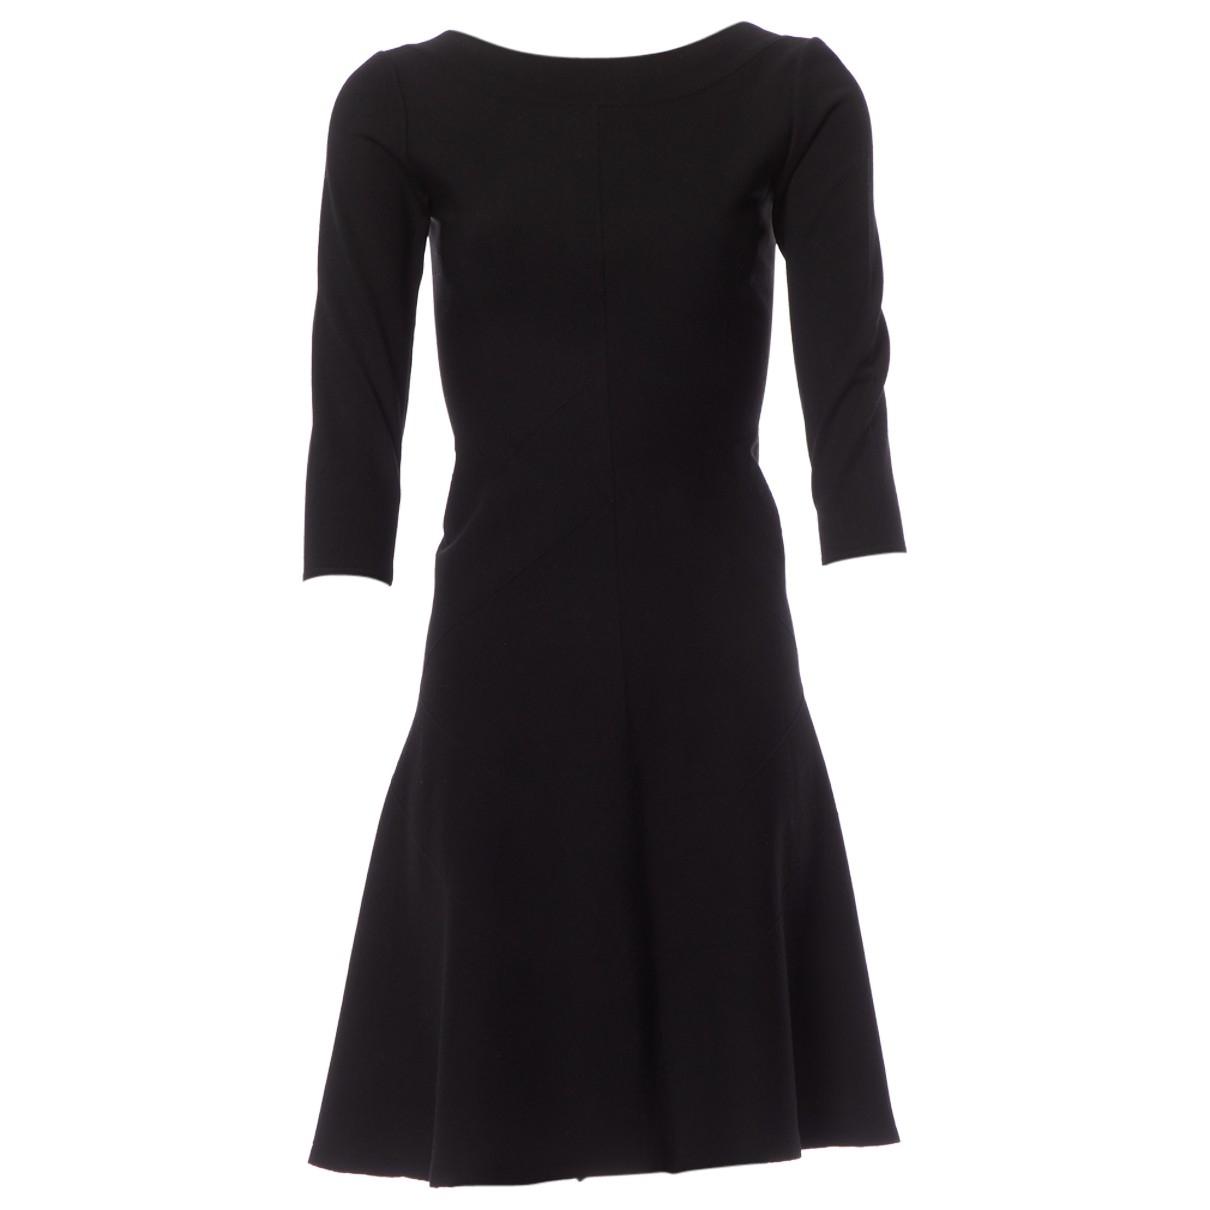 Alaïa \N Black Wool dress for Women 38 FR